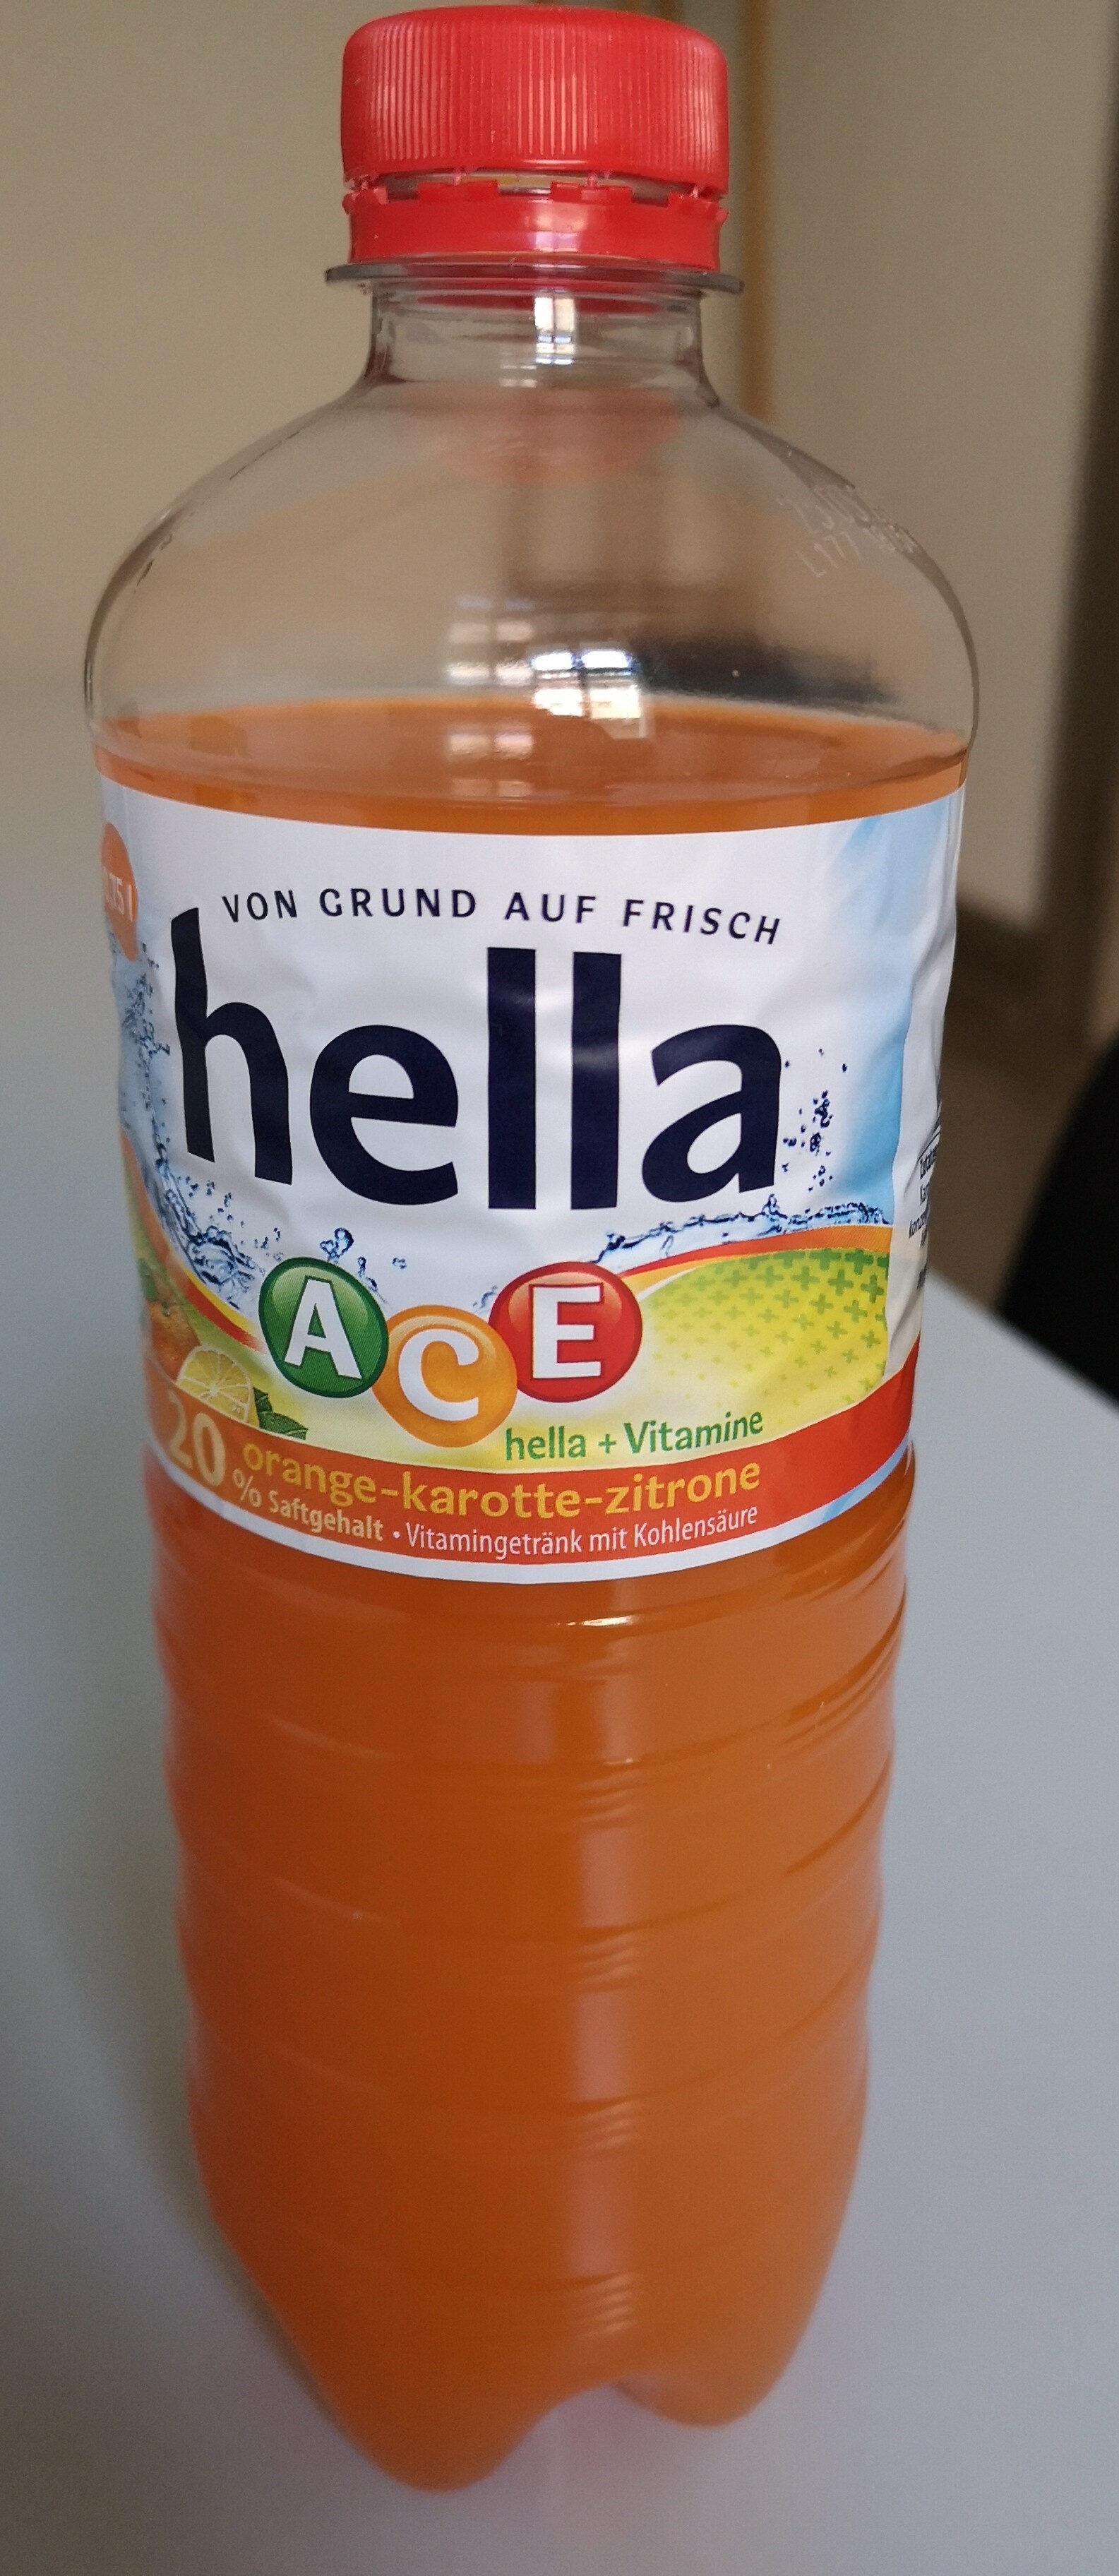 Hella: ACE - Product - de